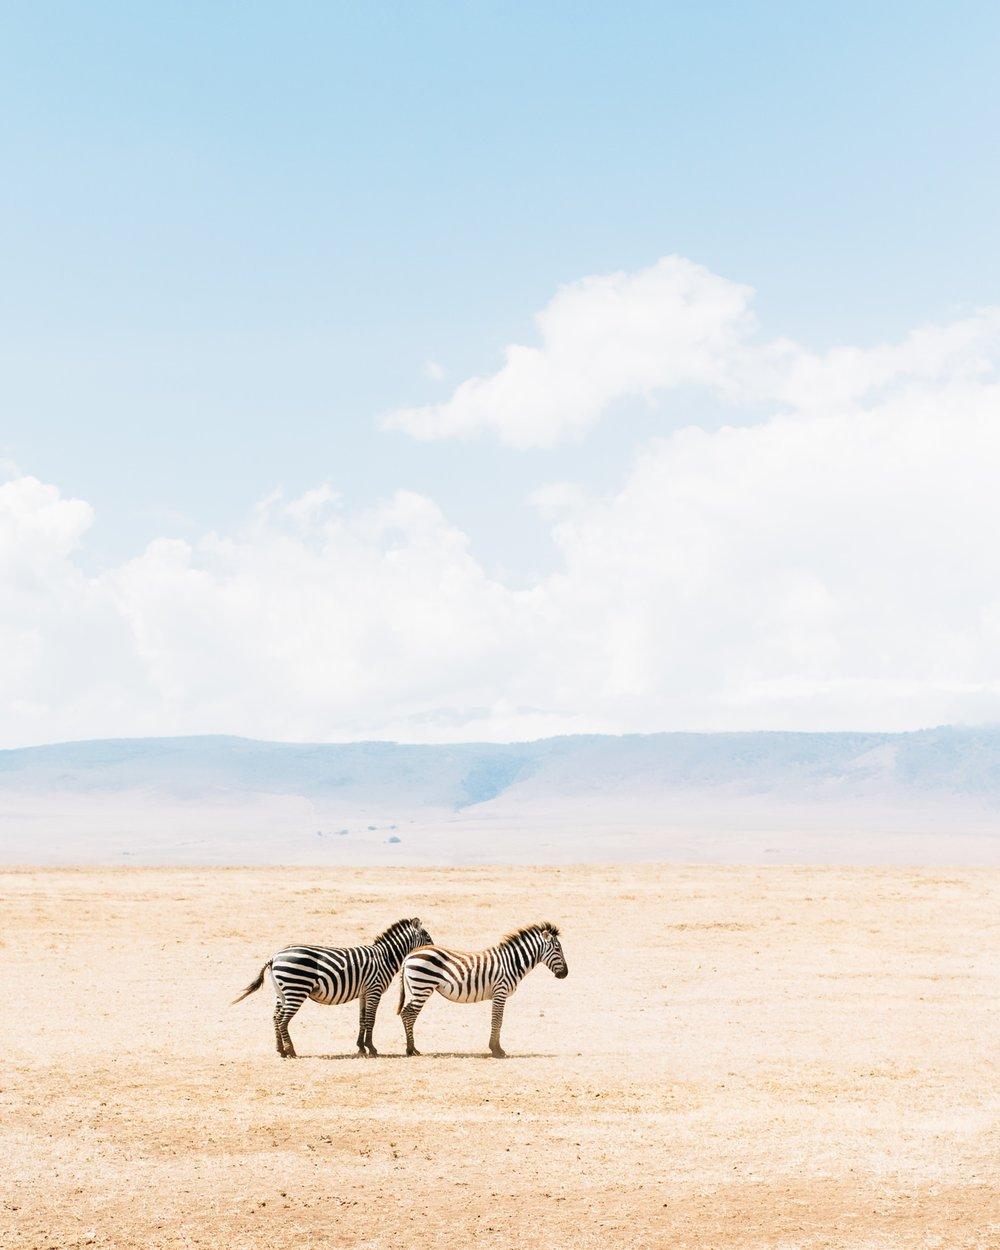 tanzania-zebras-travel-photographer-cameron-zegers.jpg